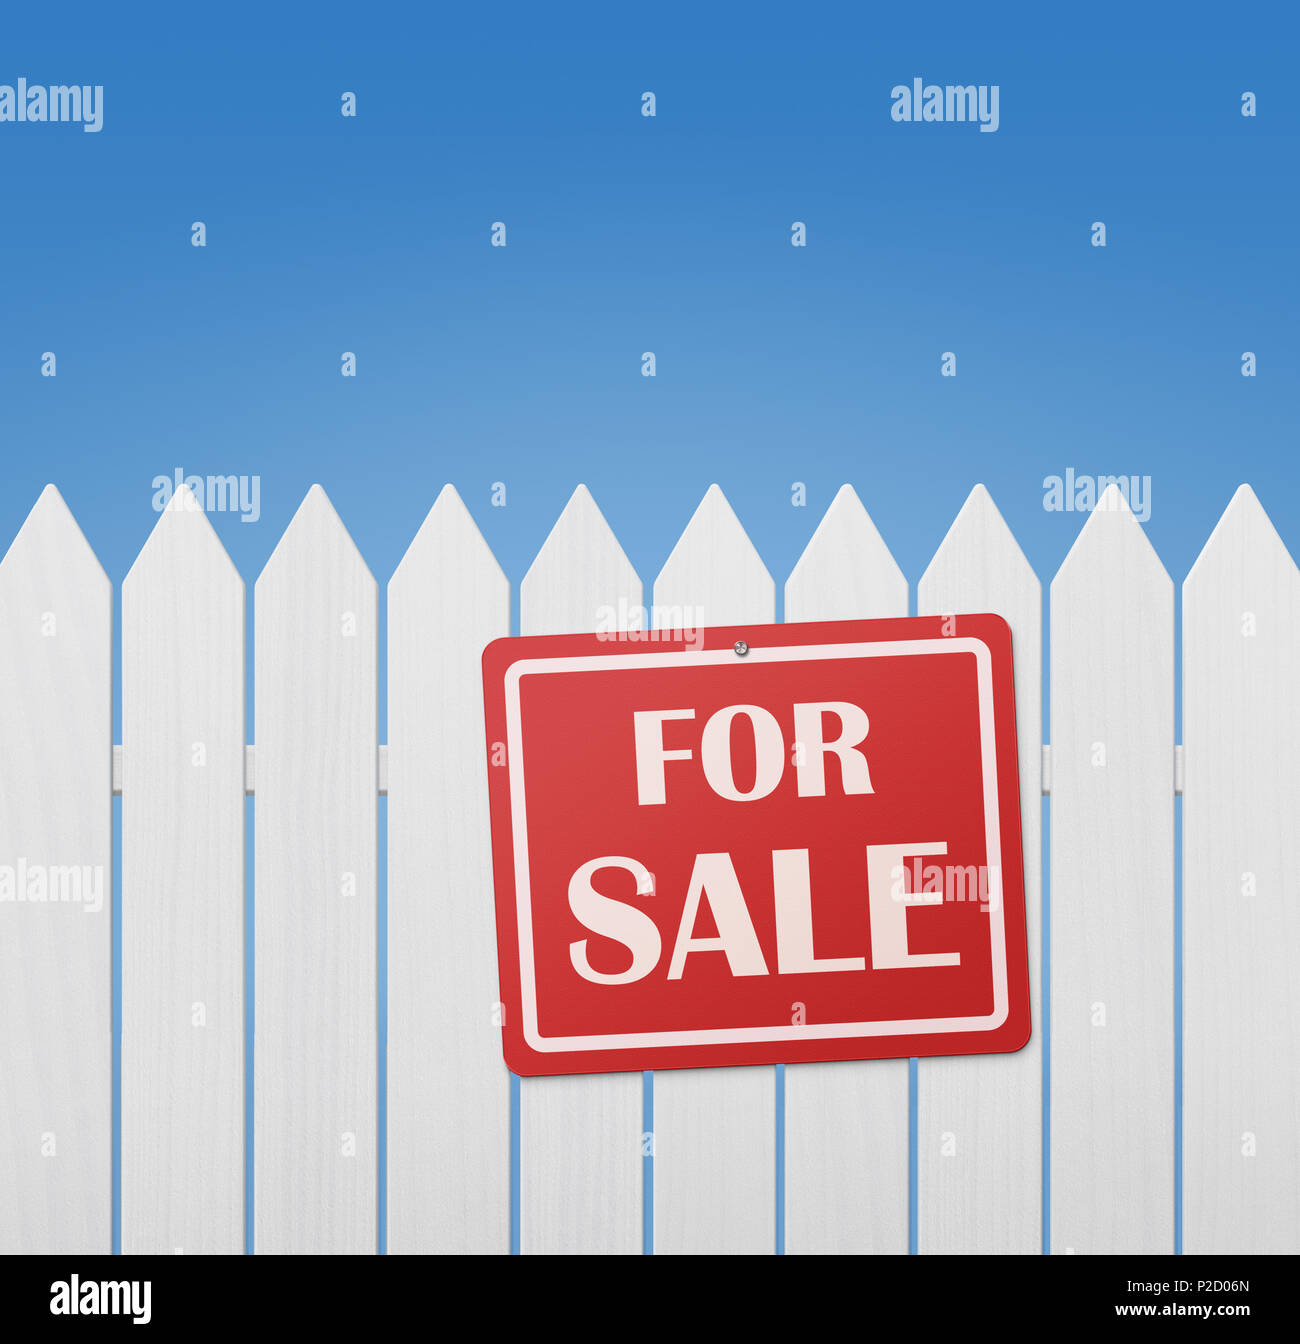 Private Garage For Sale Stockfotos & Private Garage For Sale Bilder ...